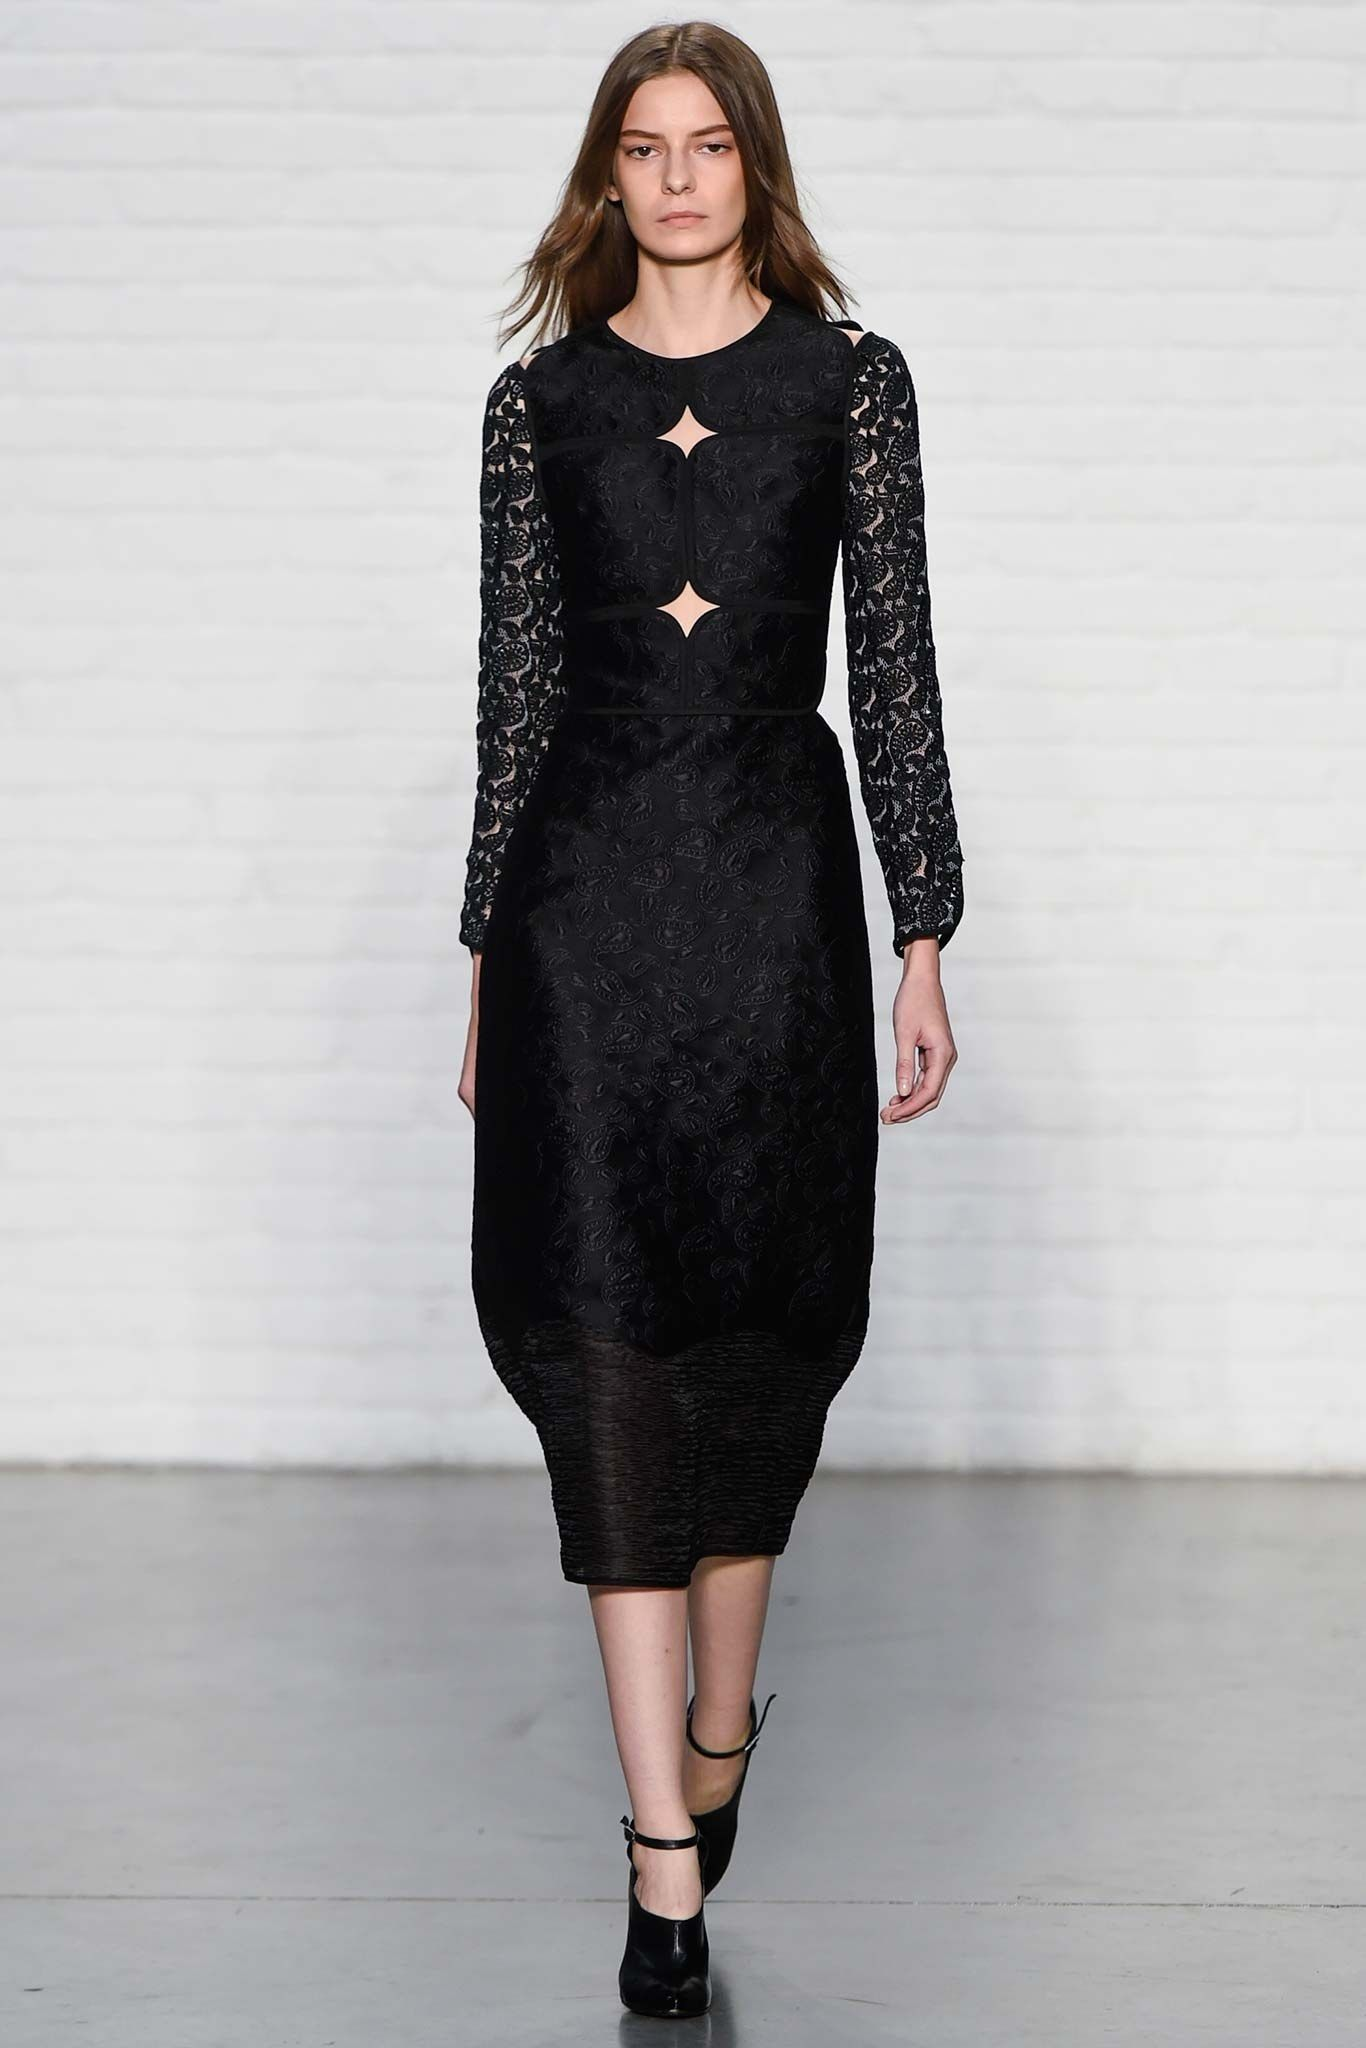 Yigal Azrouël Spring 2015 Ready-to-Wear Fashion Show - Dasha Denisenko